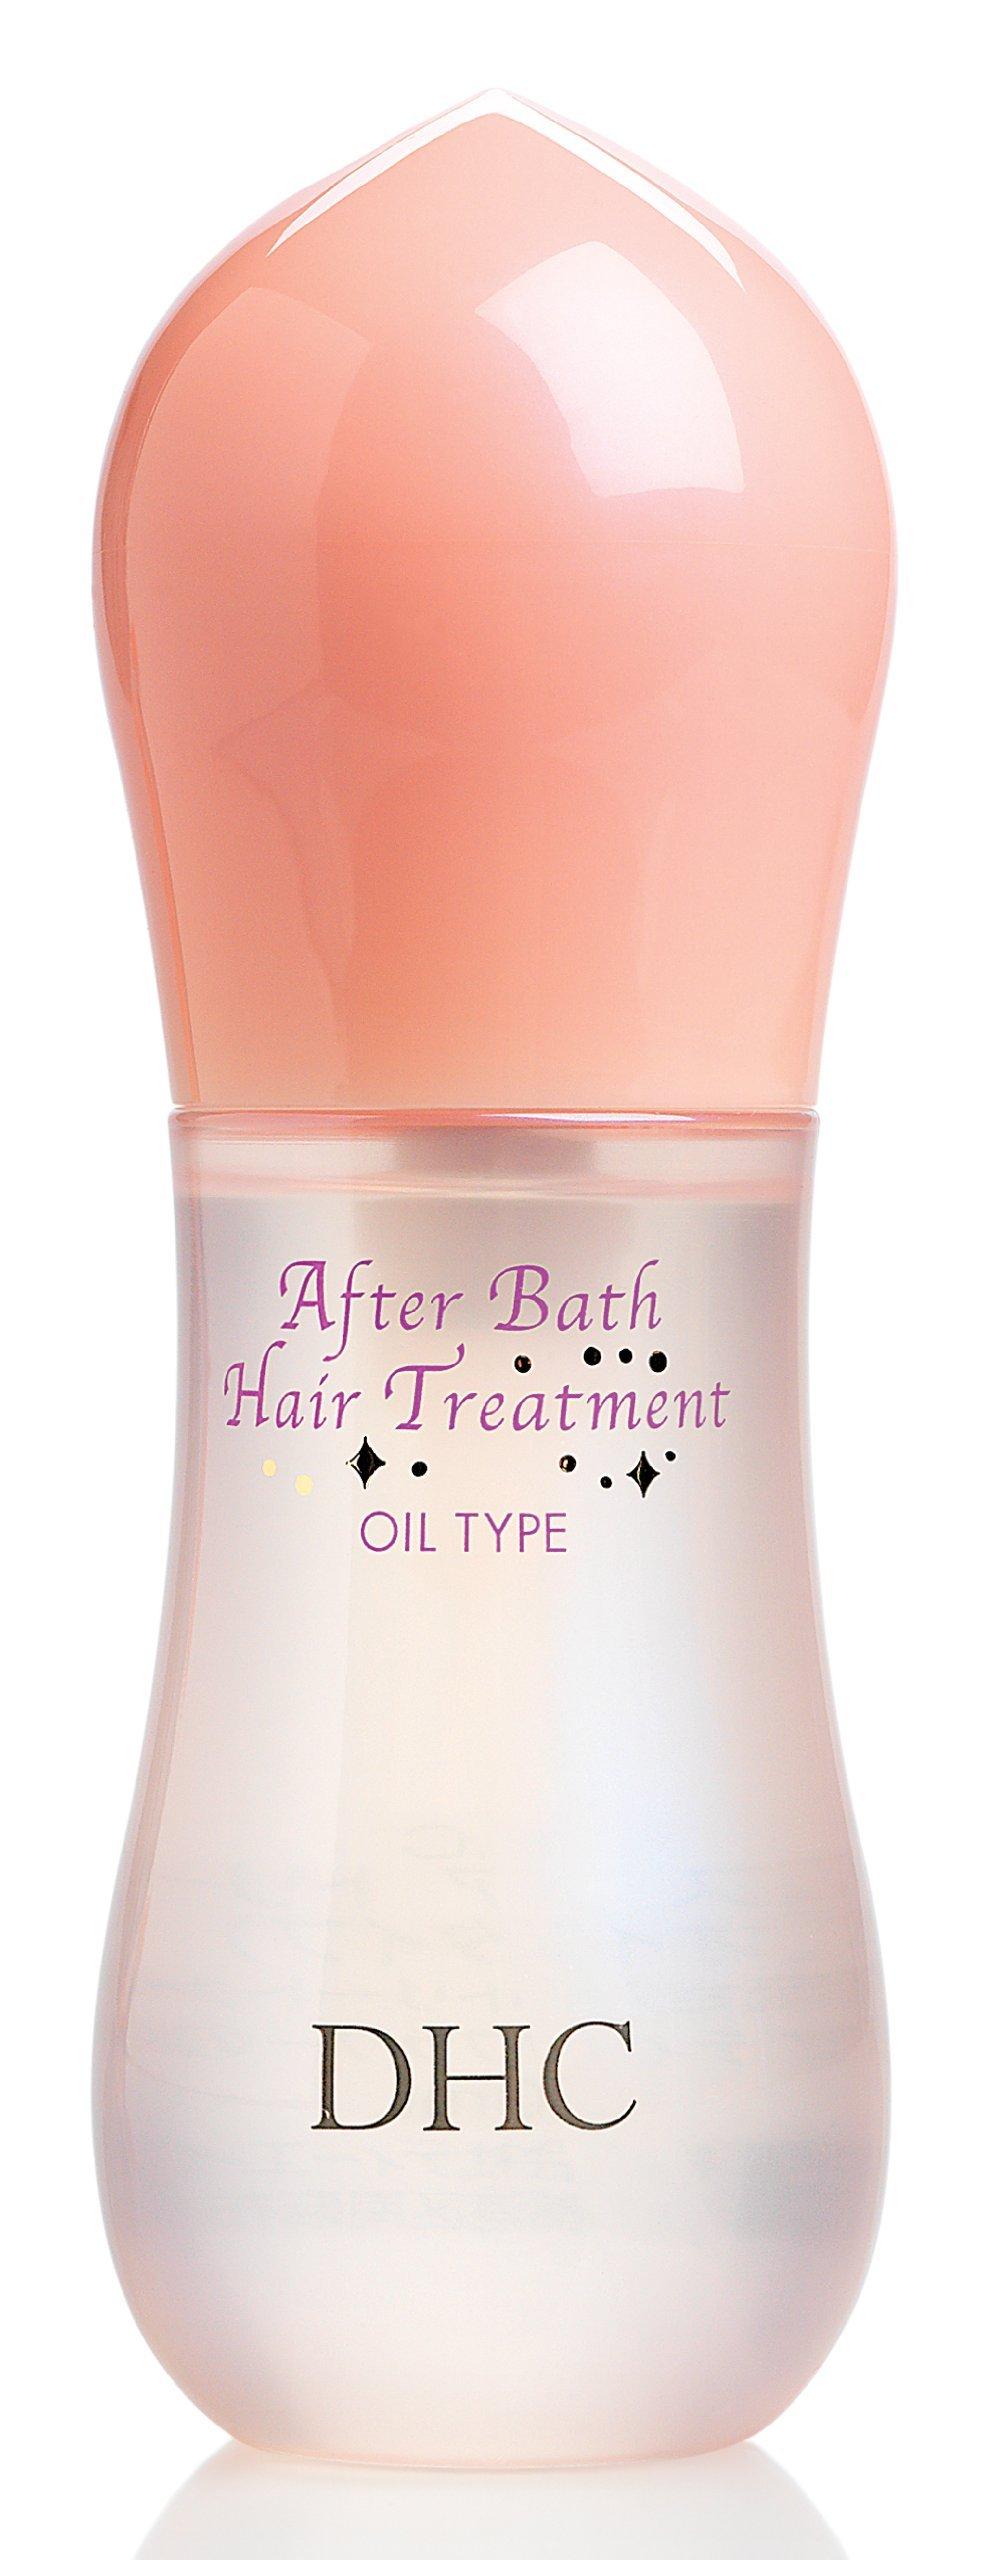 DHC After Bath Hair Treatment Oil, 3.3 oz.